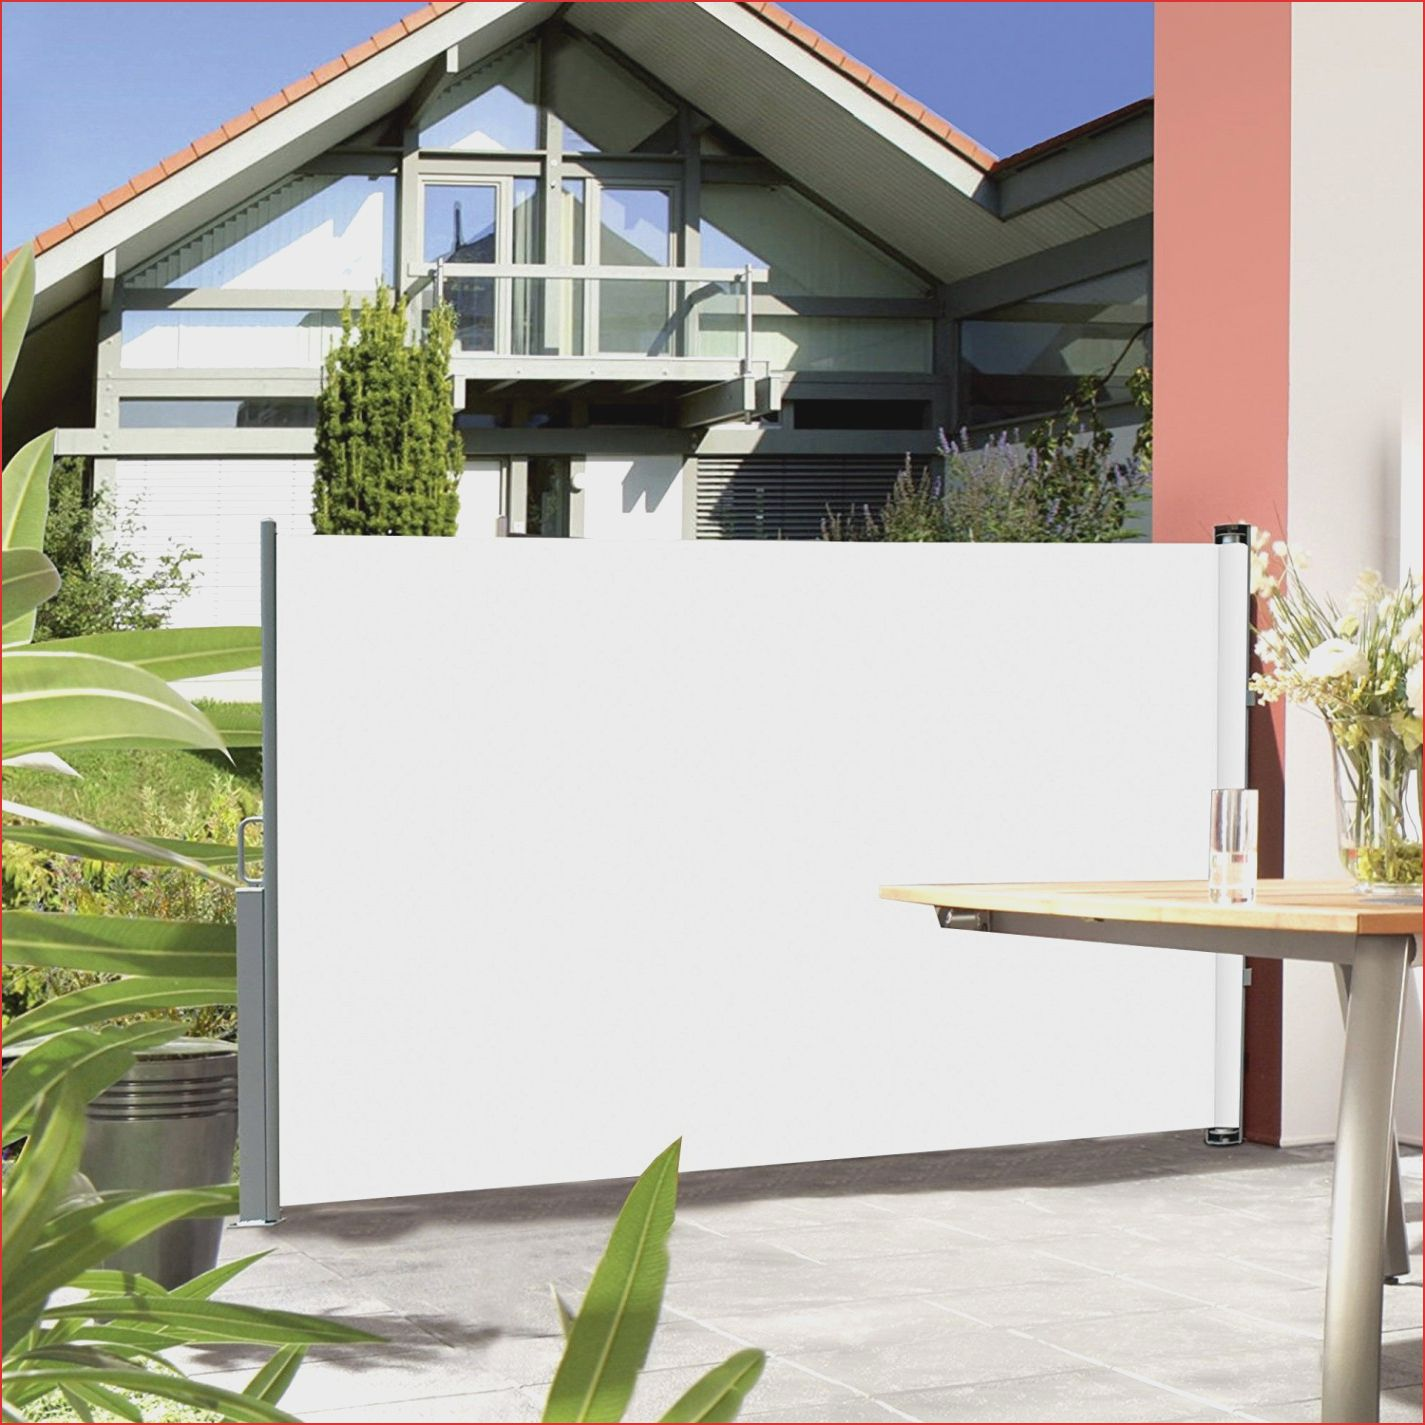 Garten Design 28 Frisch Balkon Windschutz Ohne Bohren O99p Check